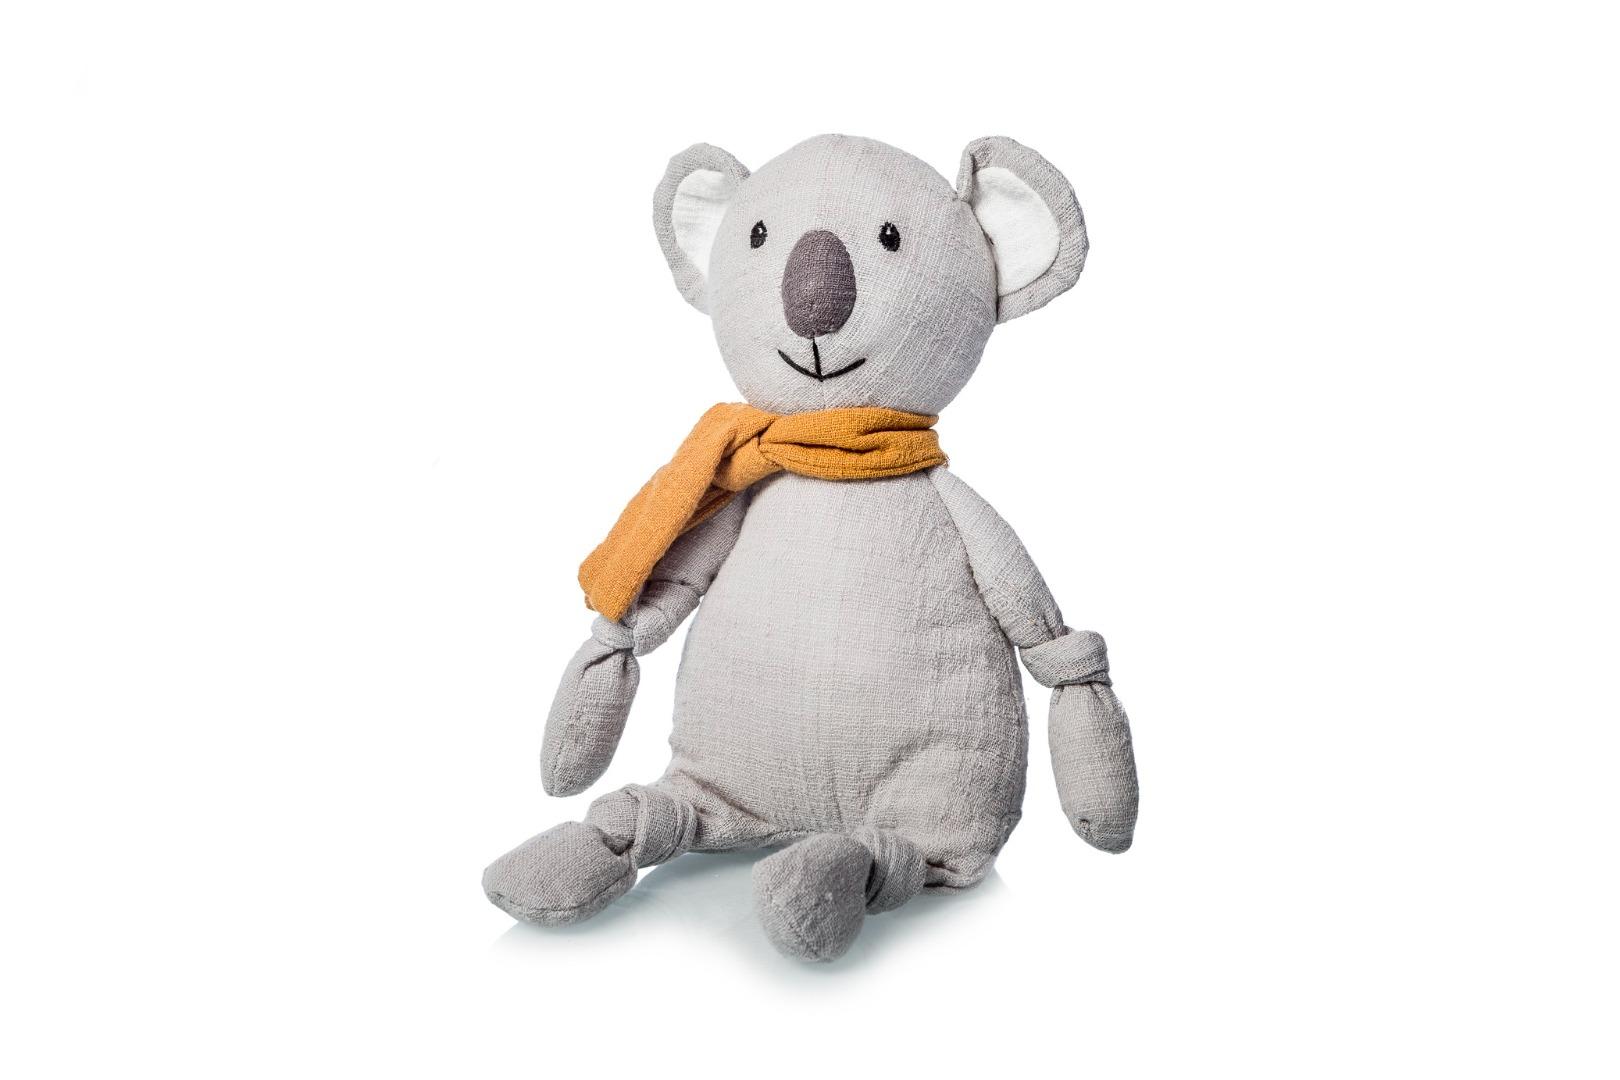 Peluche de algodón de un Koala para bebés